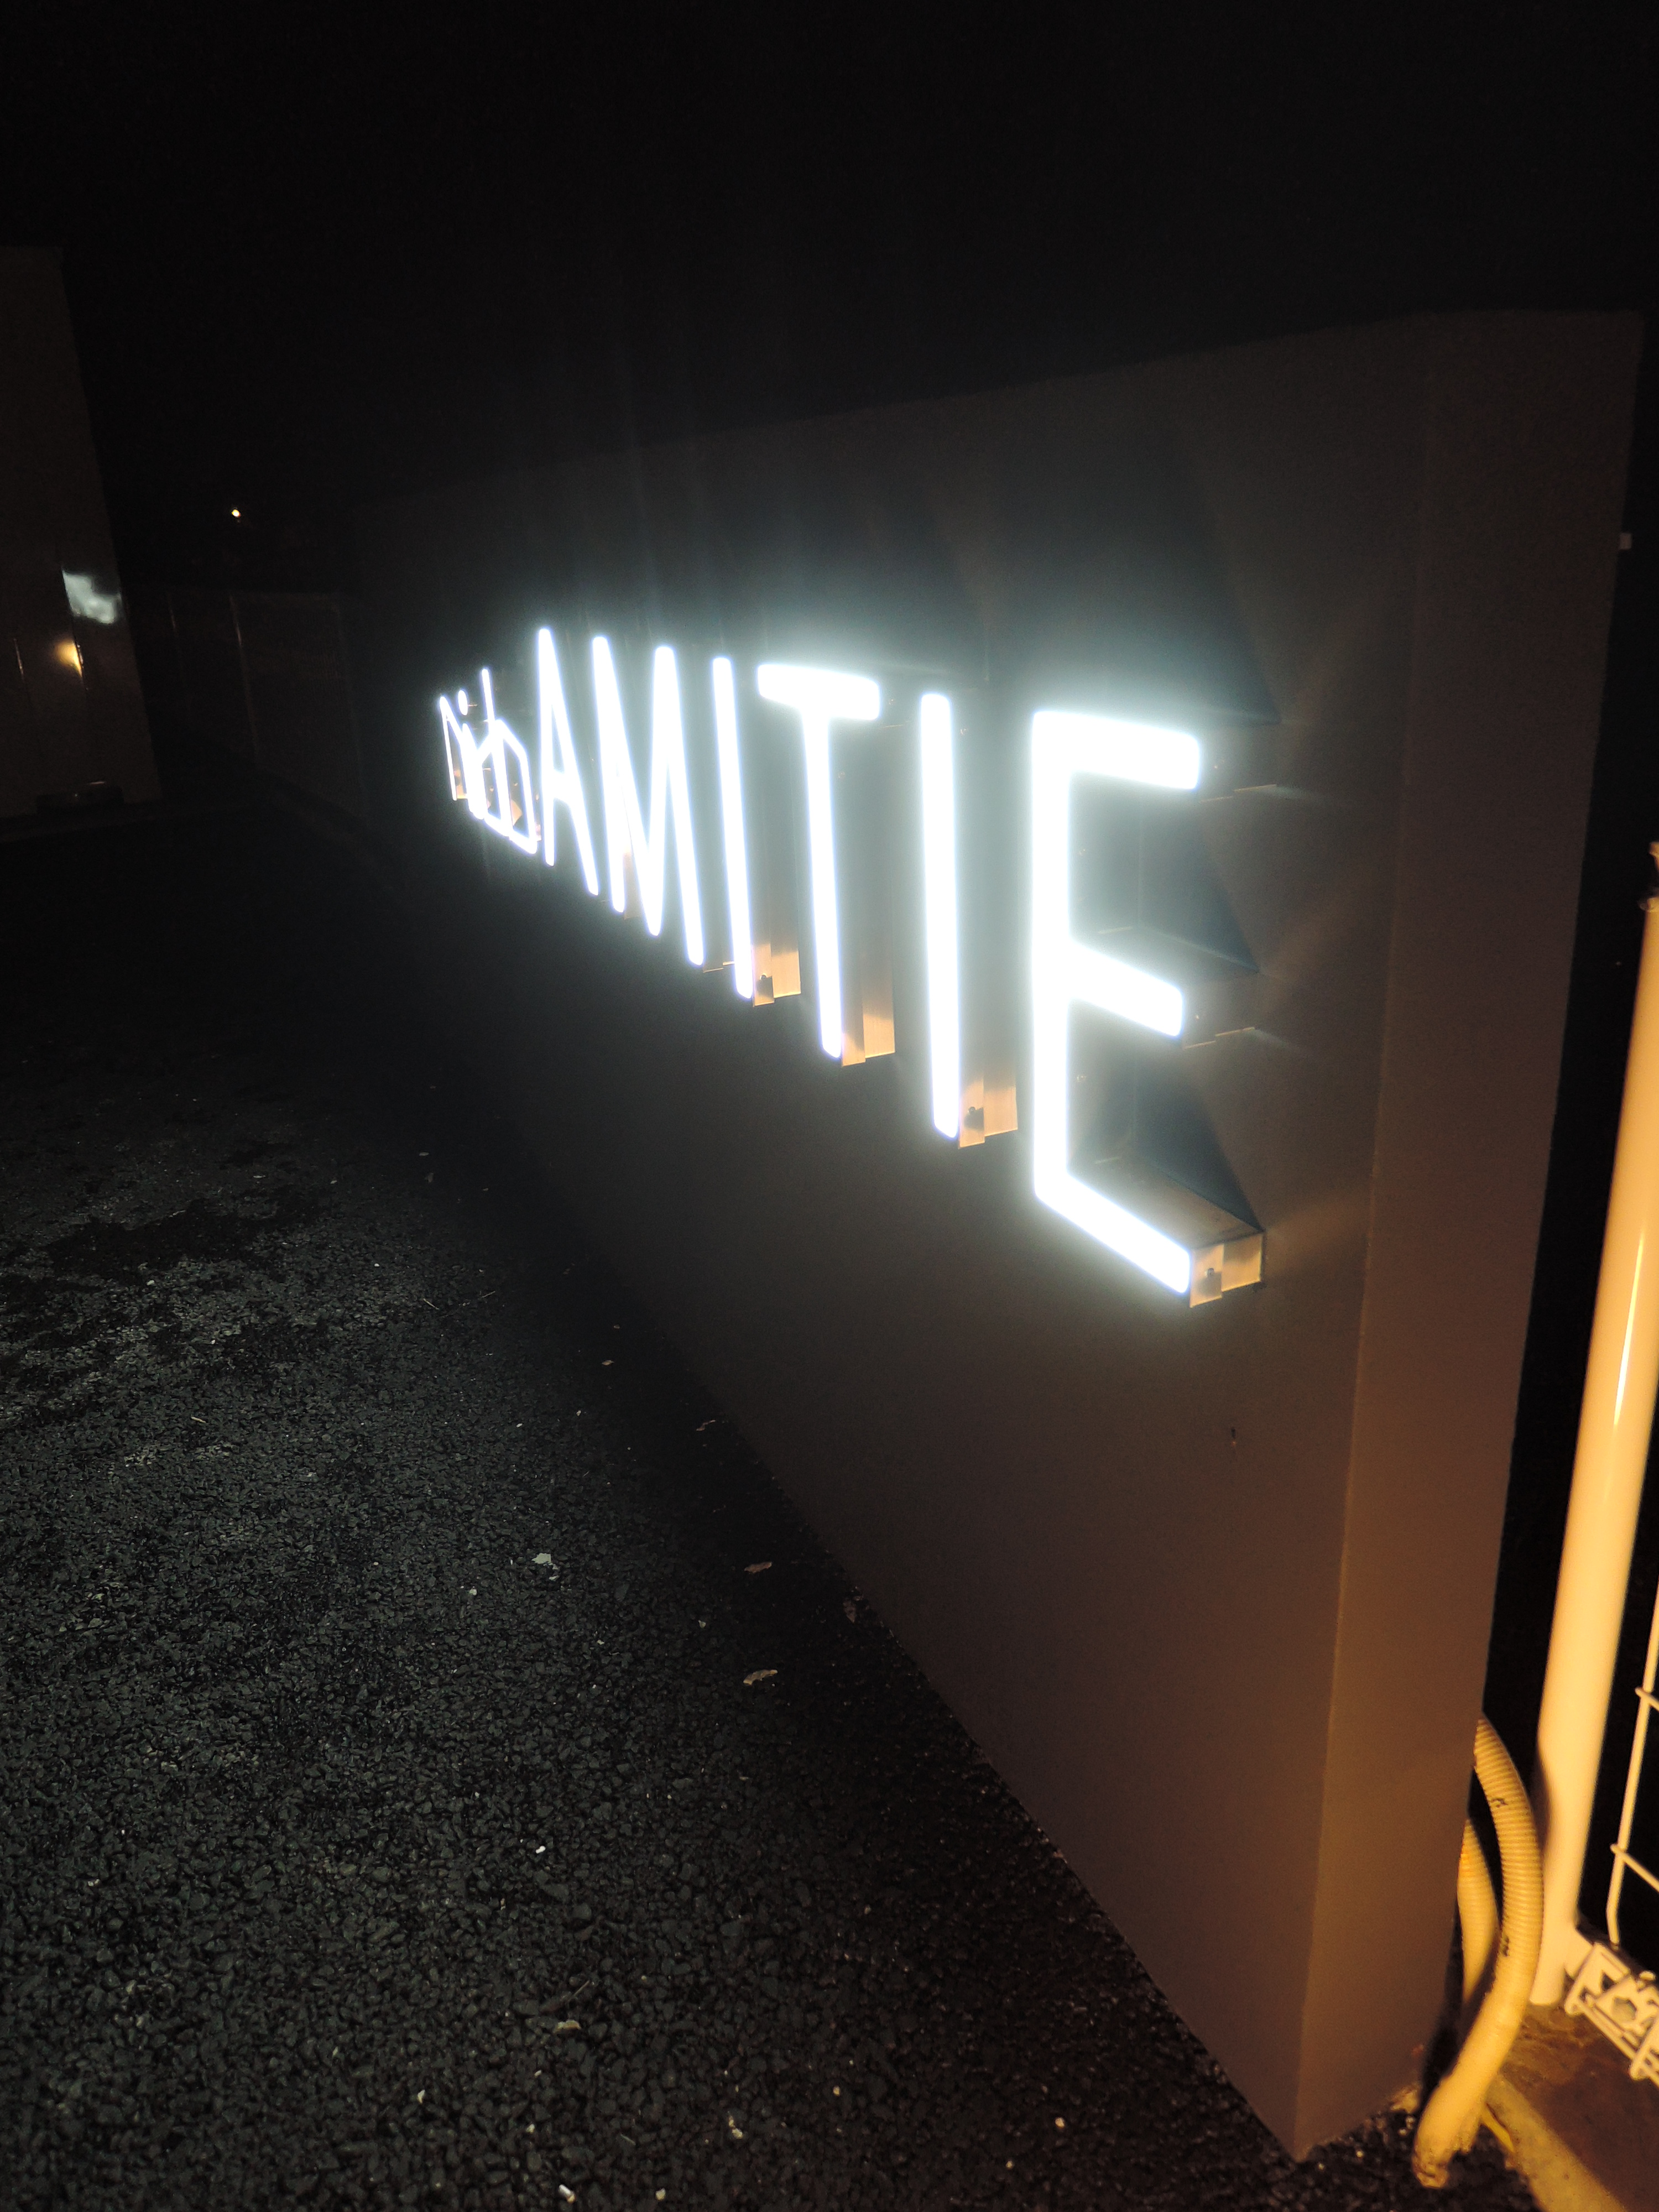 LEDマンション銘板